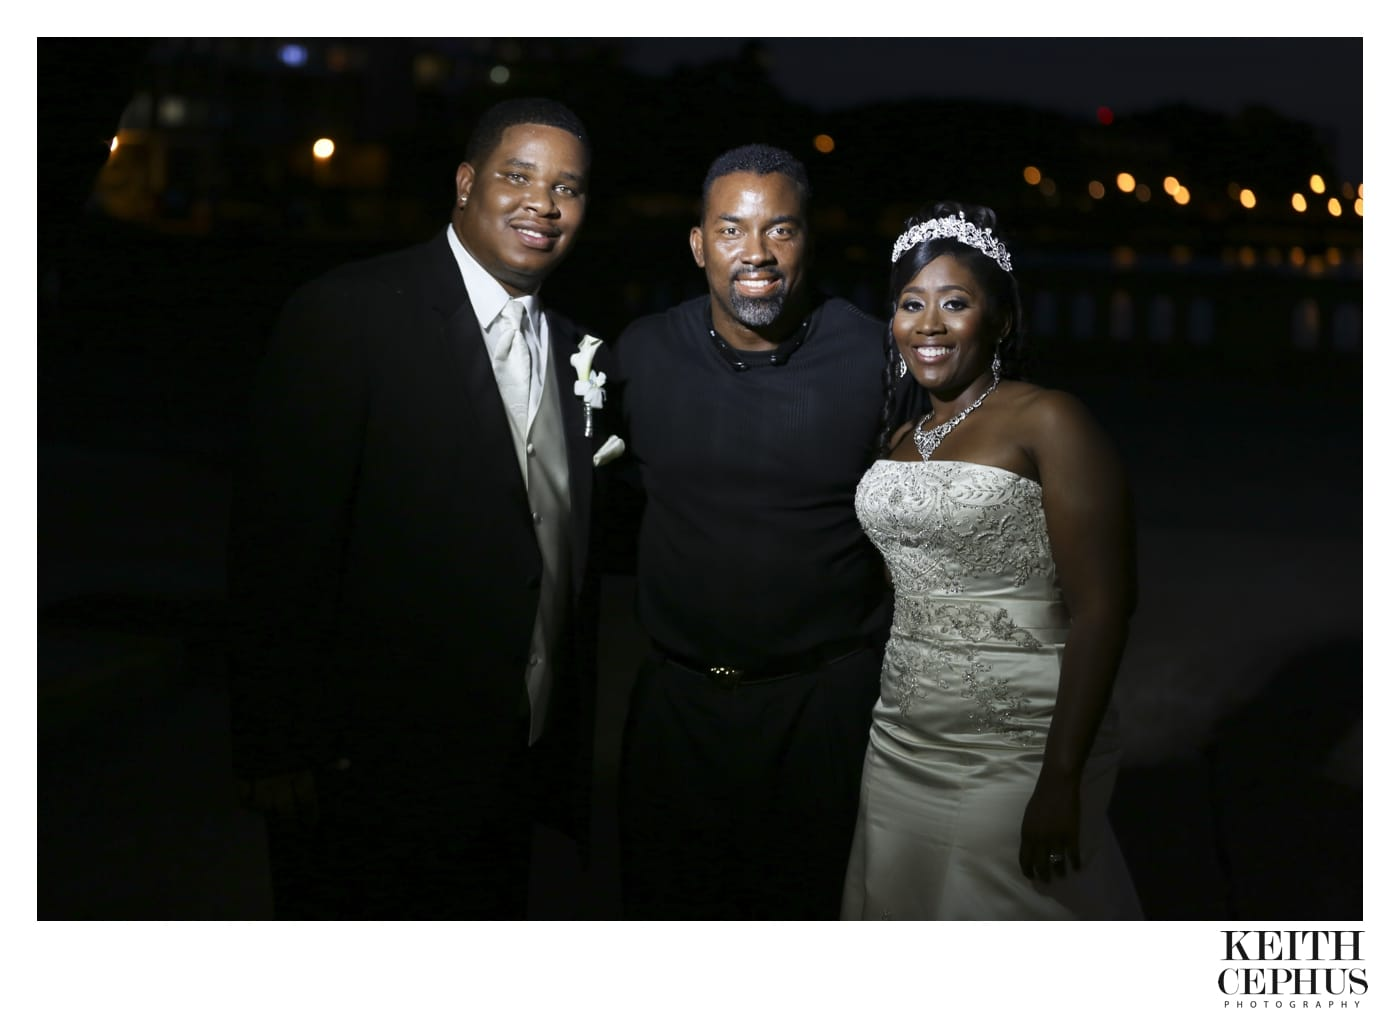 Chrysler Museum of Art Wedding Photographer | Renee and Gabriel's Amazing Wedding at the Chrysler!